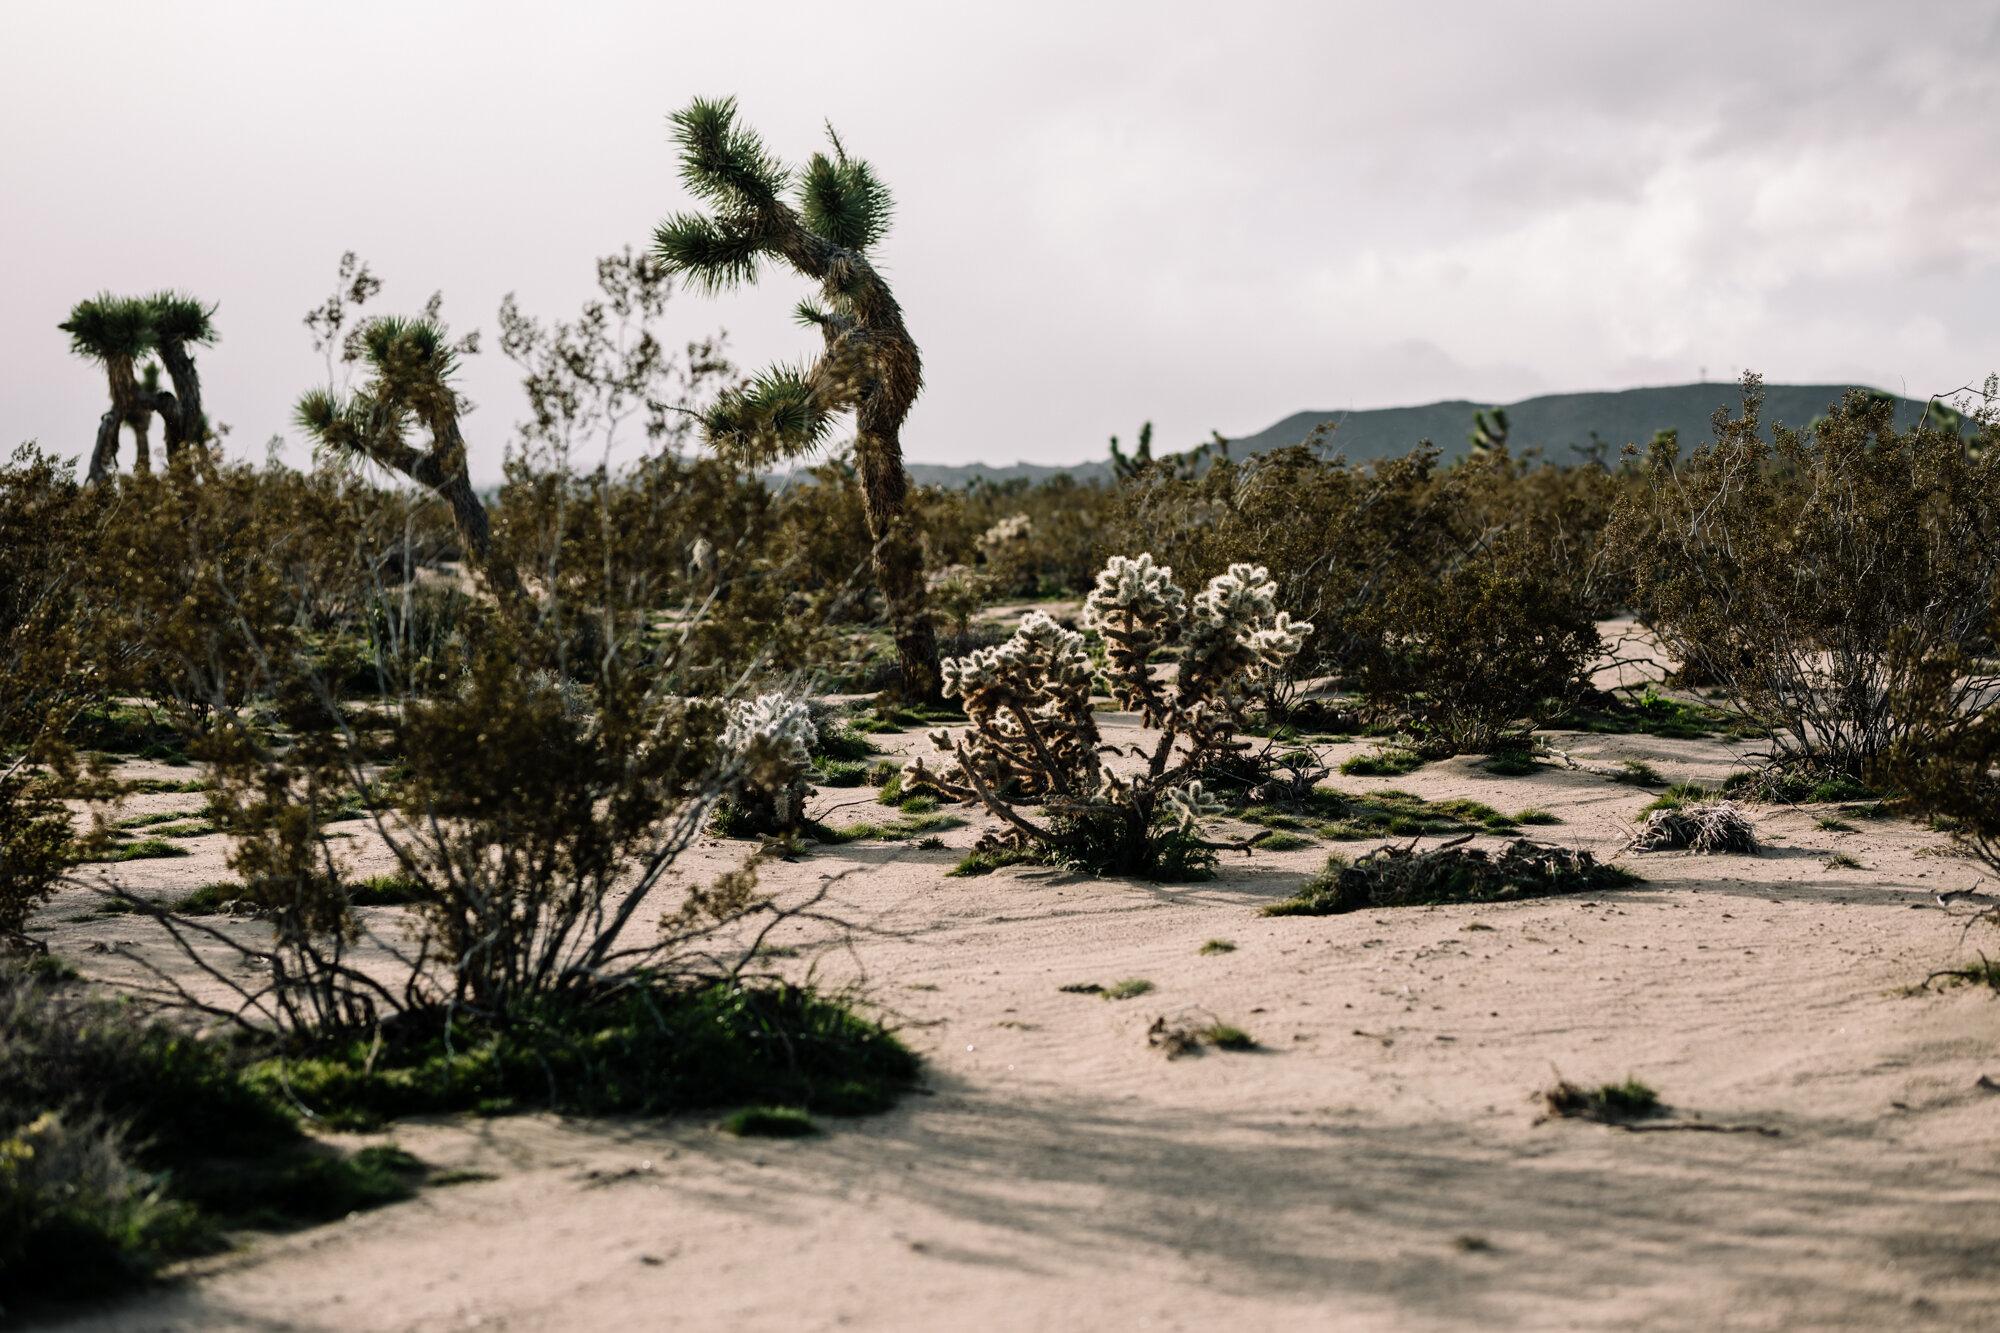 Rachel Off Duty: Joshua Tree National Park, California